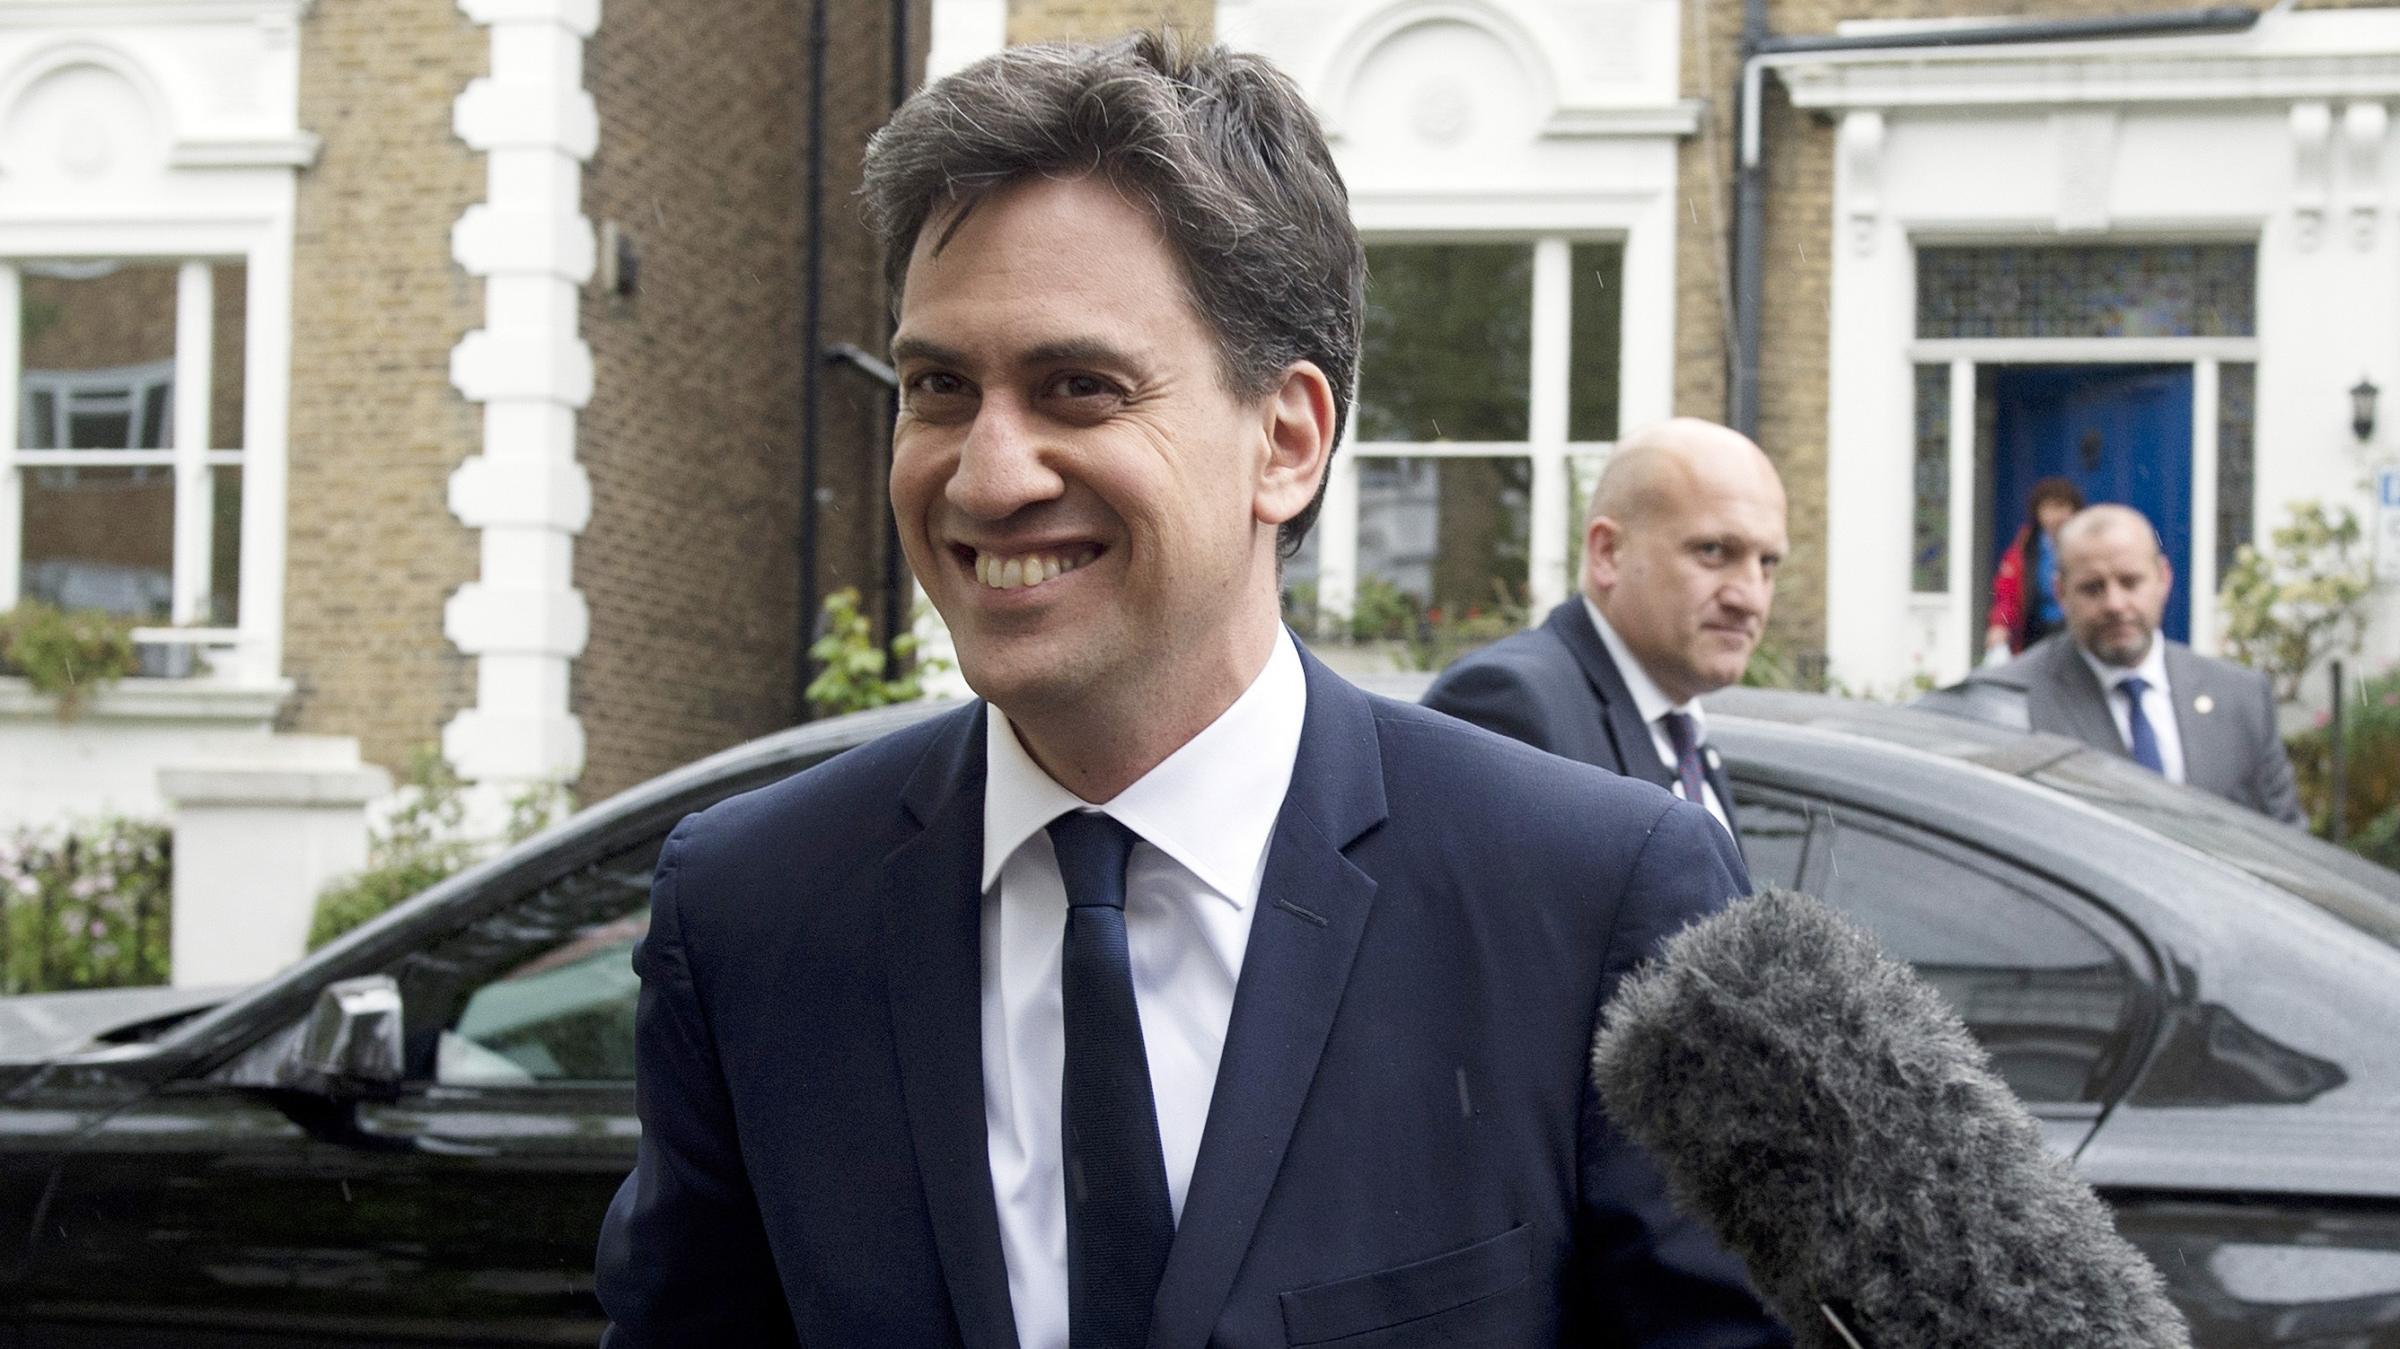 Ed Miliband and Iain Duncan Smith to host Radio 2 show